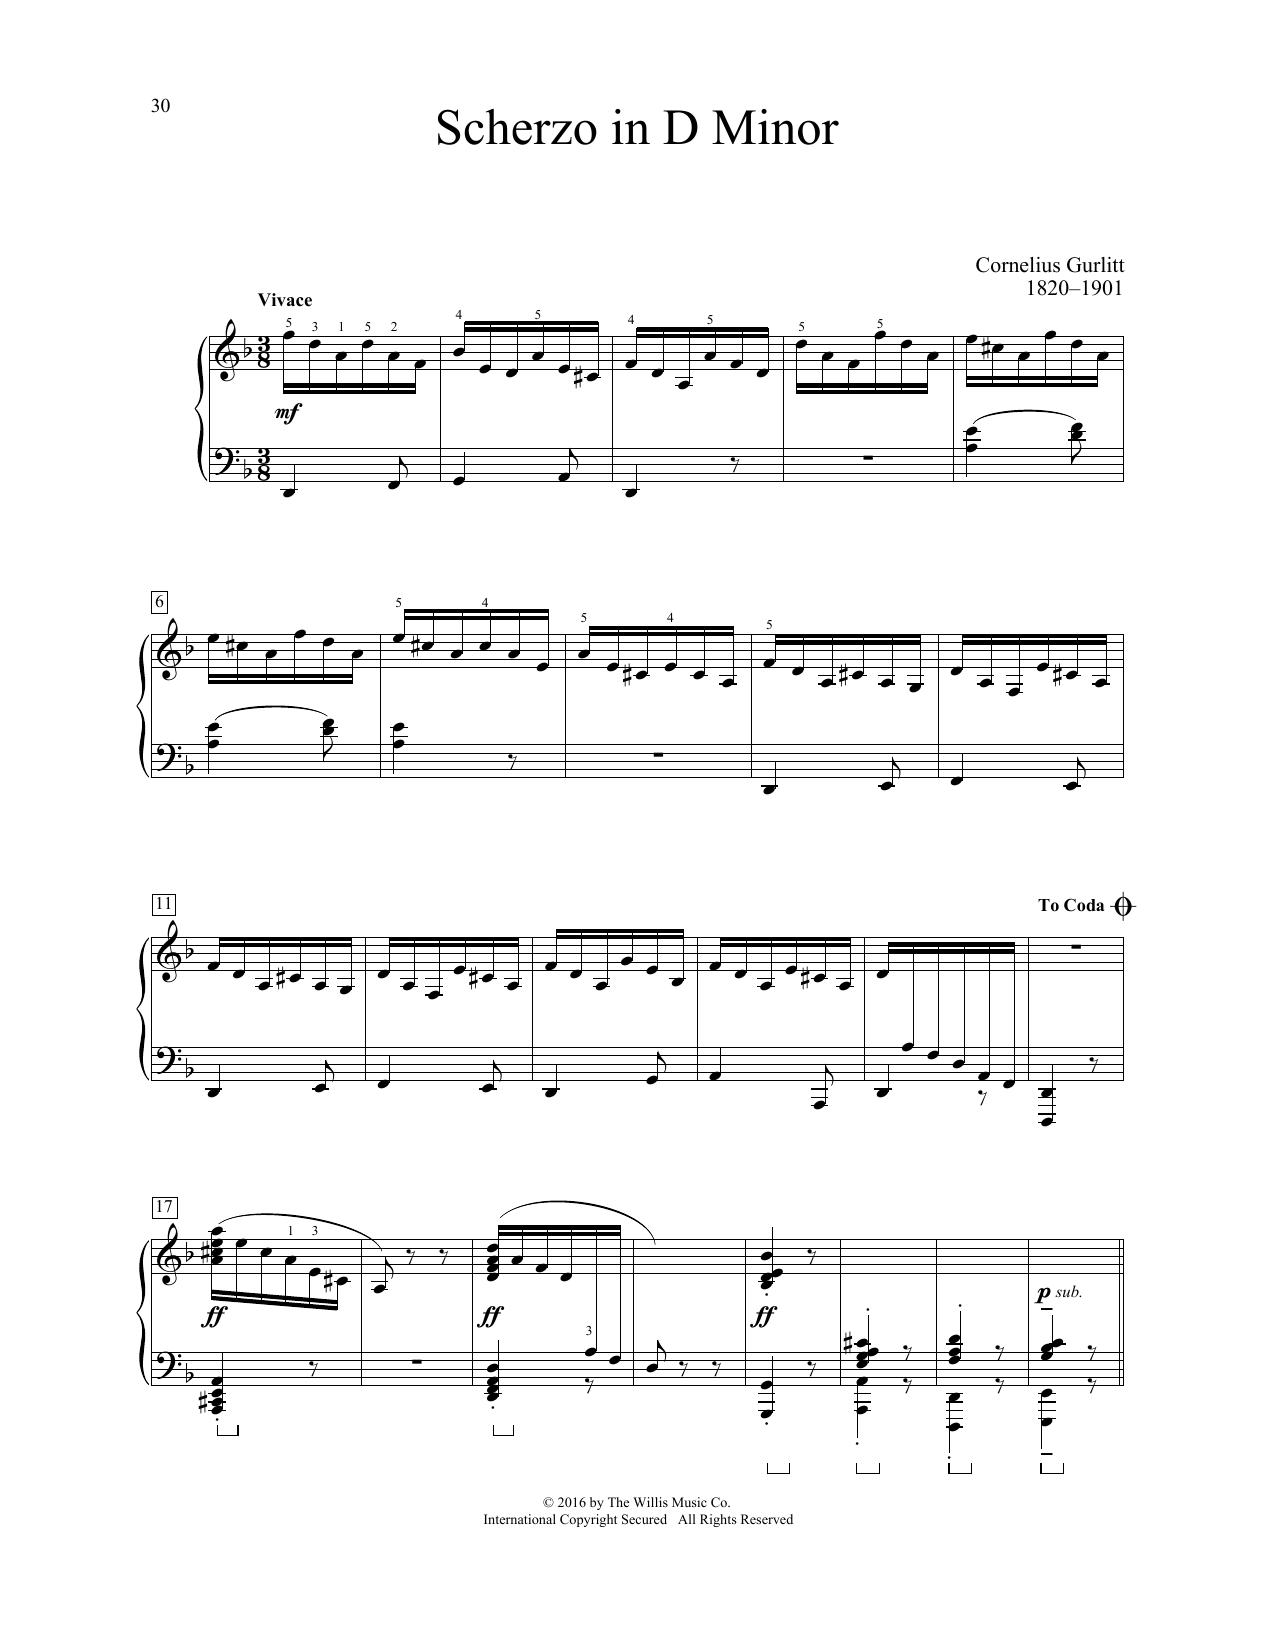 Cornelius Gurlitt Scherzo In D Minor sheet music notes and chords. Download Printable PDF.